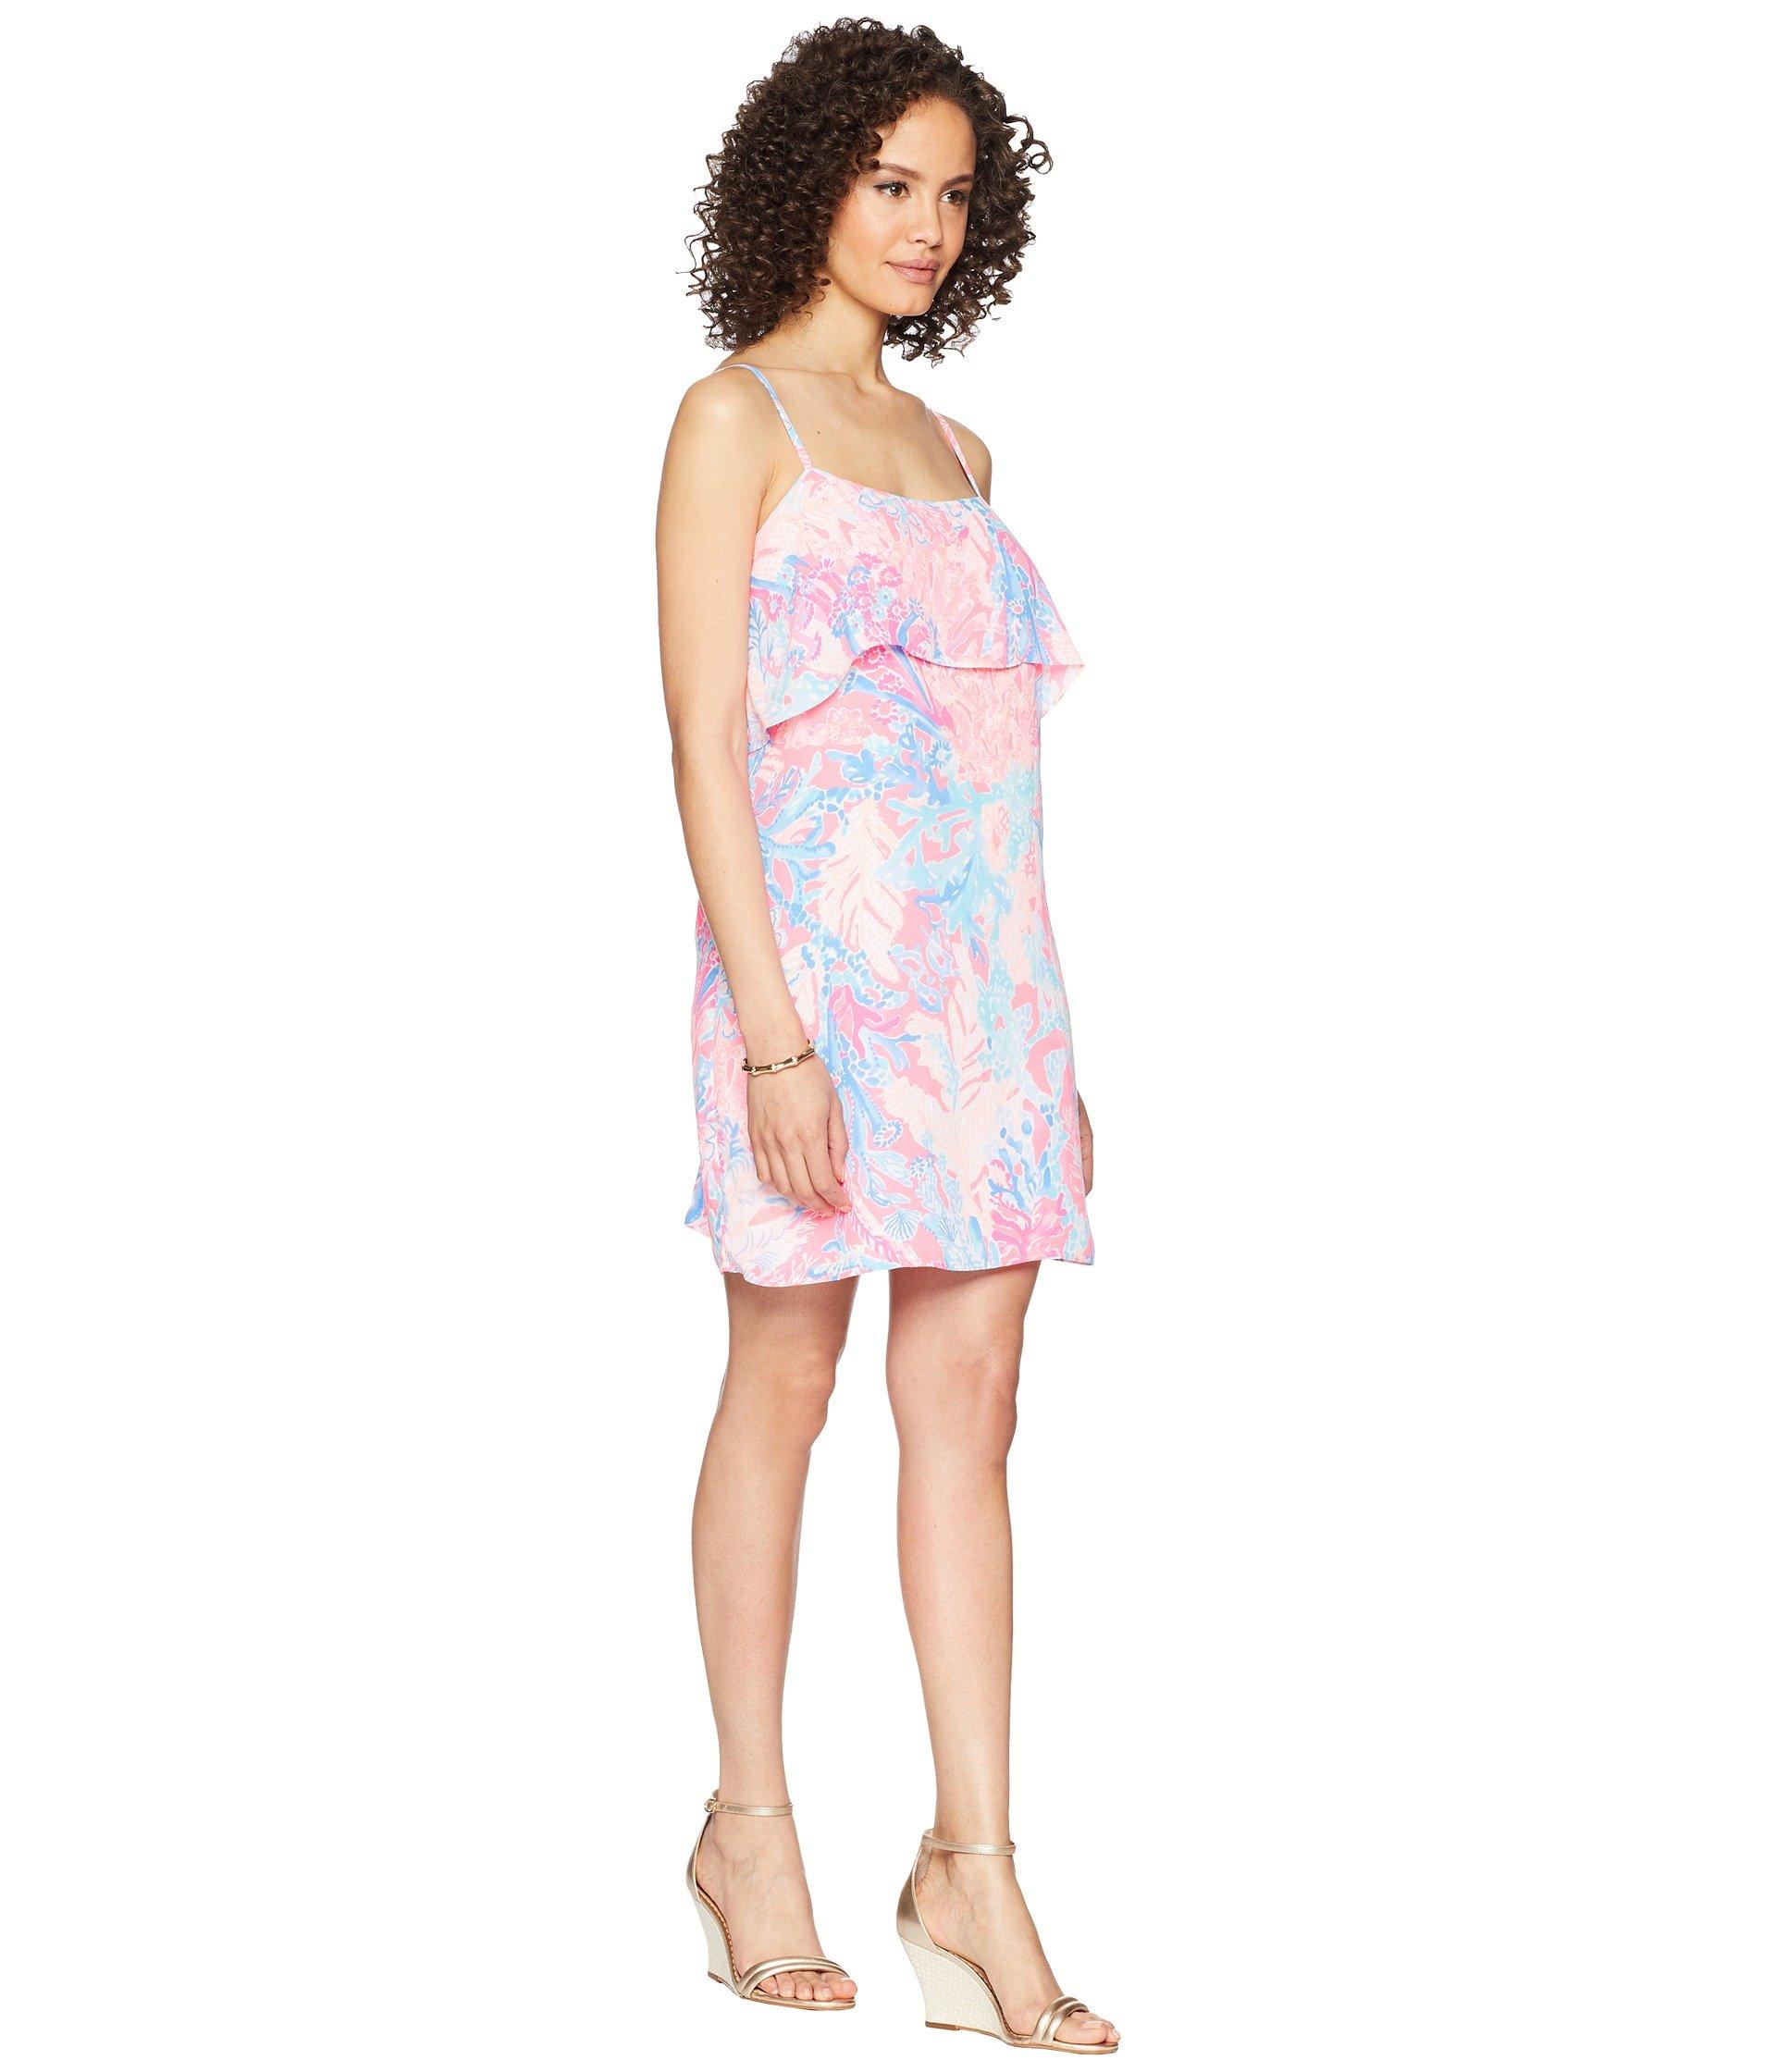 Aquadesiac Pascha Light Pulitzer Lilly Lexi Dress xXqpnfBw